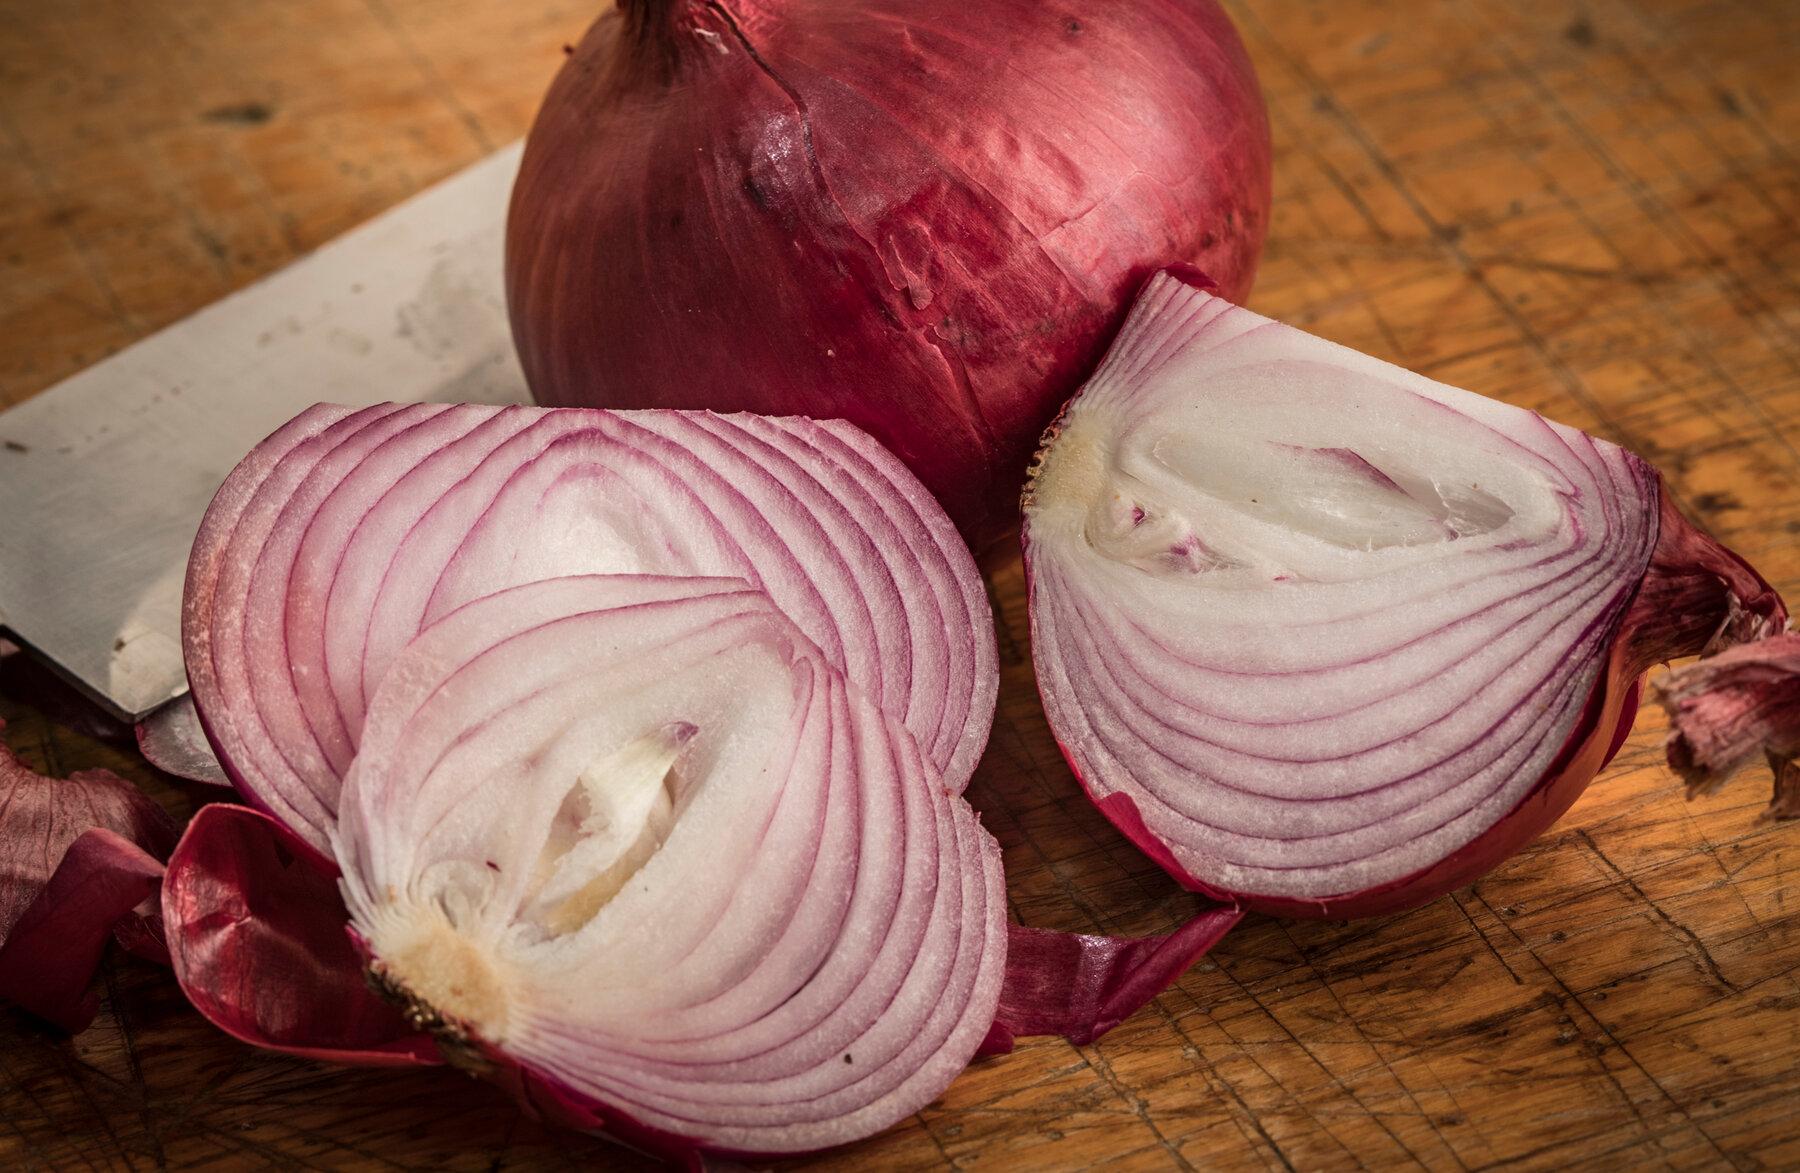 01xp-onion-salmonella–ox-mobileMasterAt3x